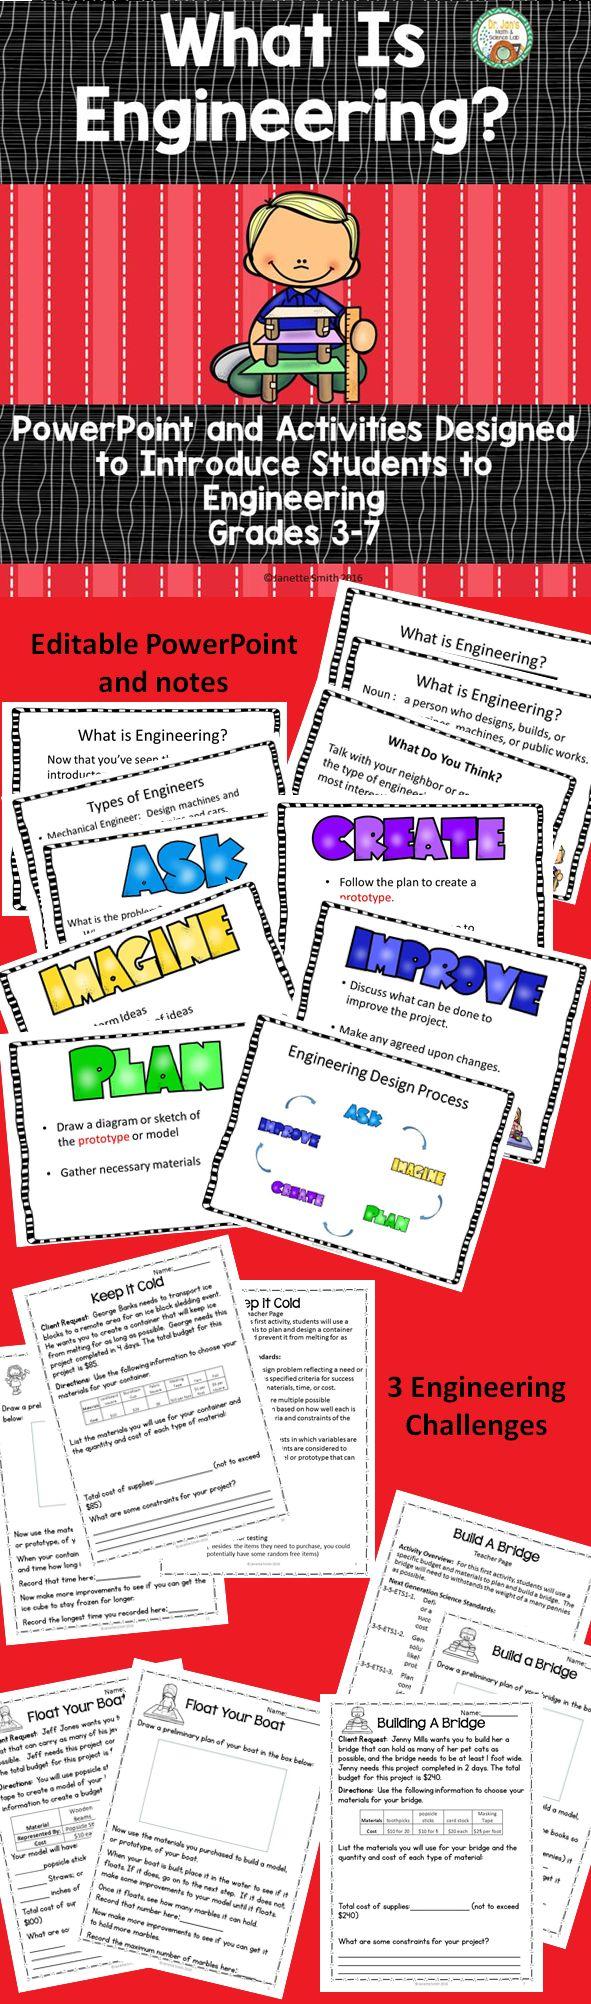 Poster design challenge - Engineering Design Process Powerpoint And Activities